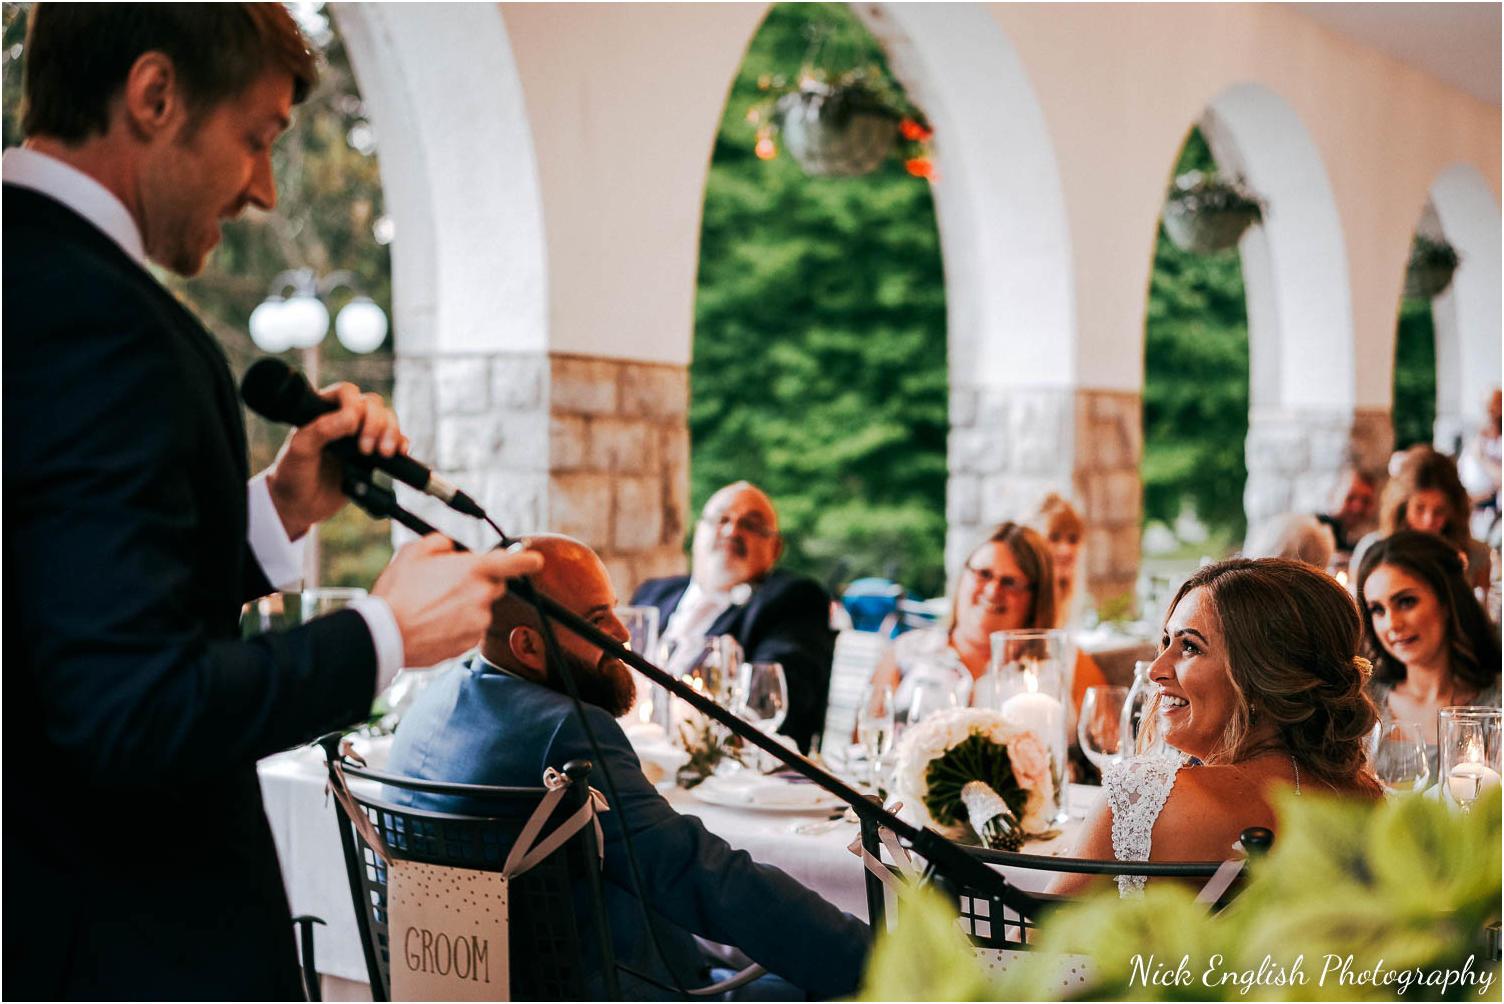 Destination_Wedding_Photographer_Slovenia_Nick_English_Photography-80.jpg